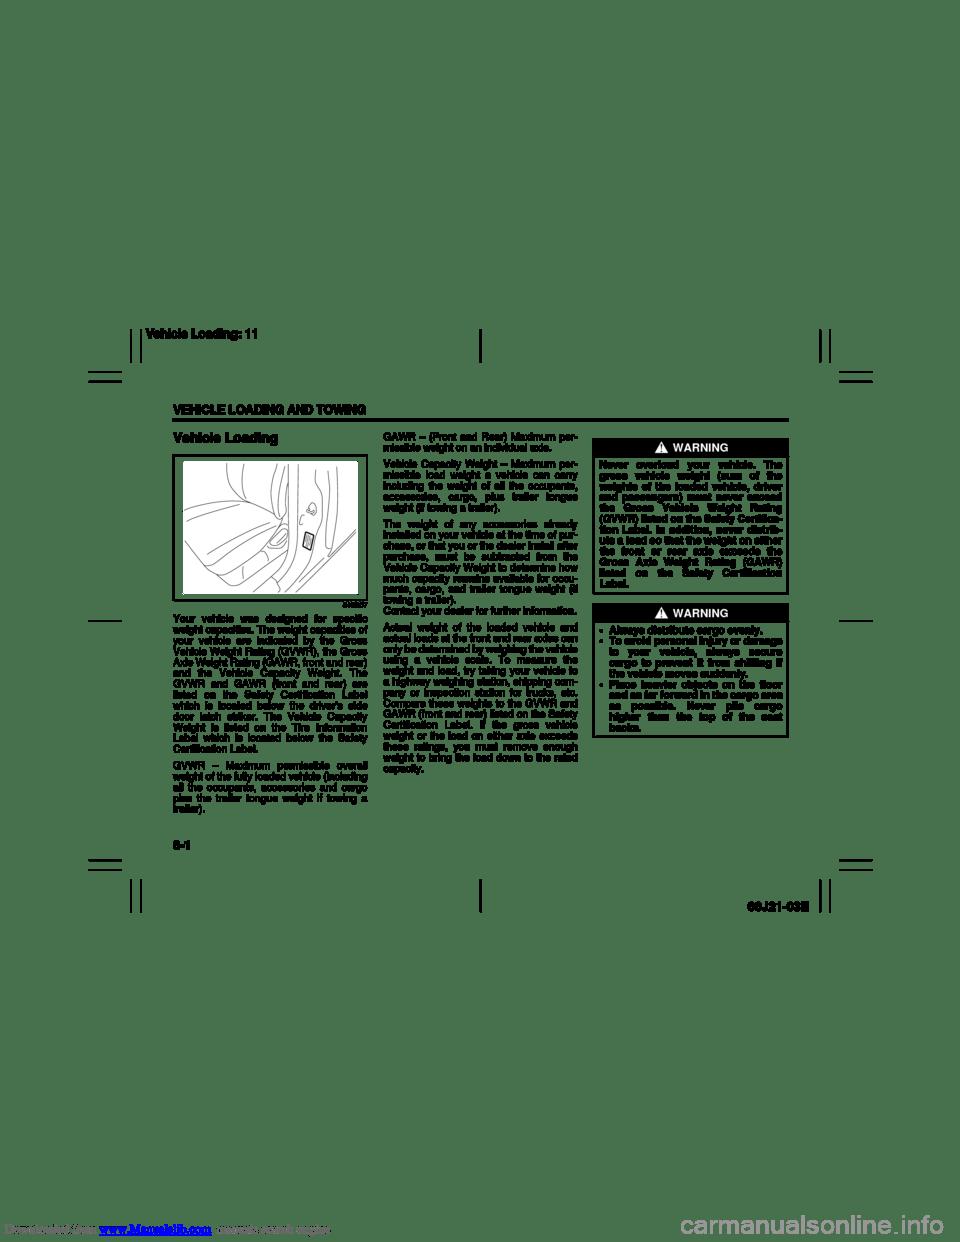 SUZUKI GRAND VITARA 2007 3.G Owners Manual (211 Pages